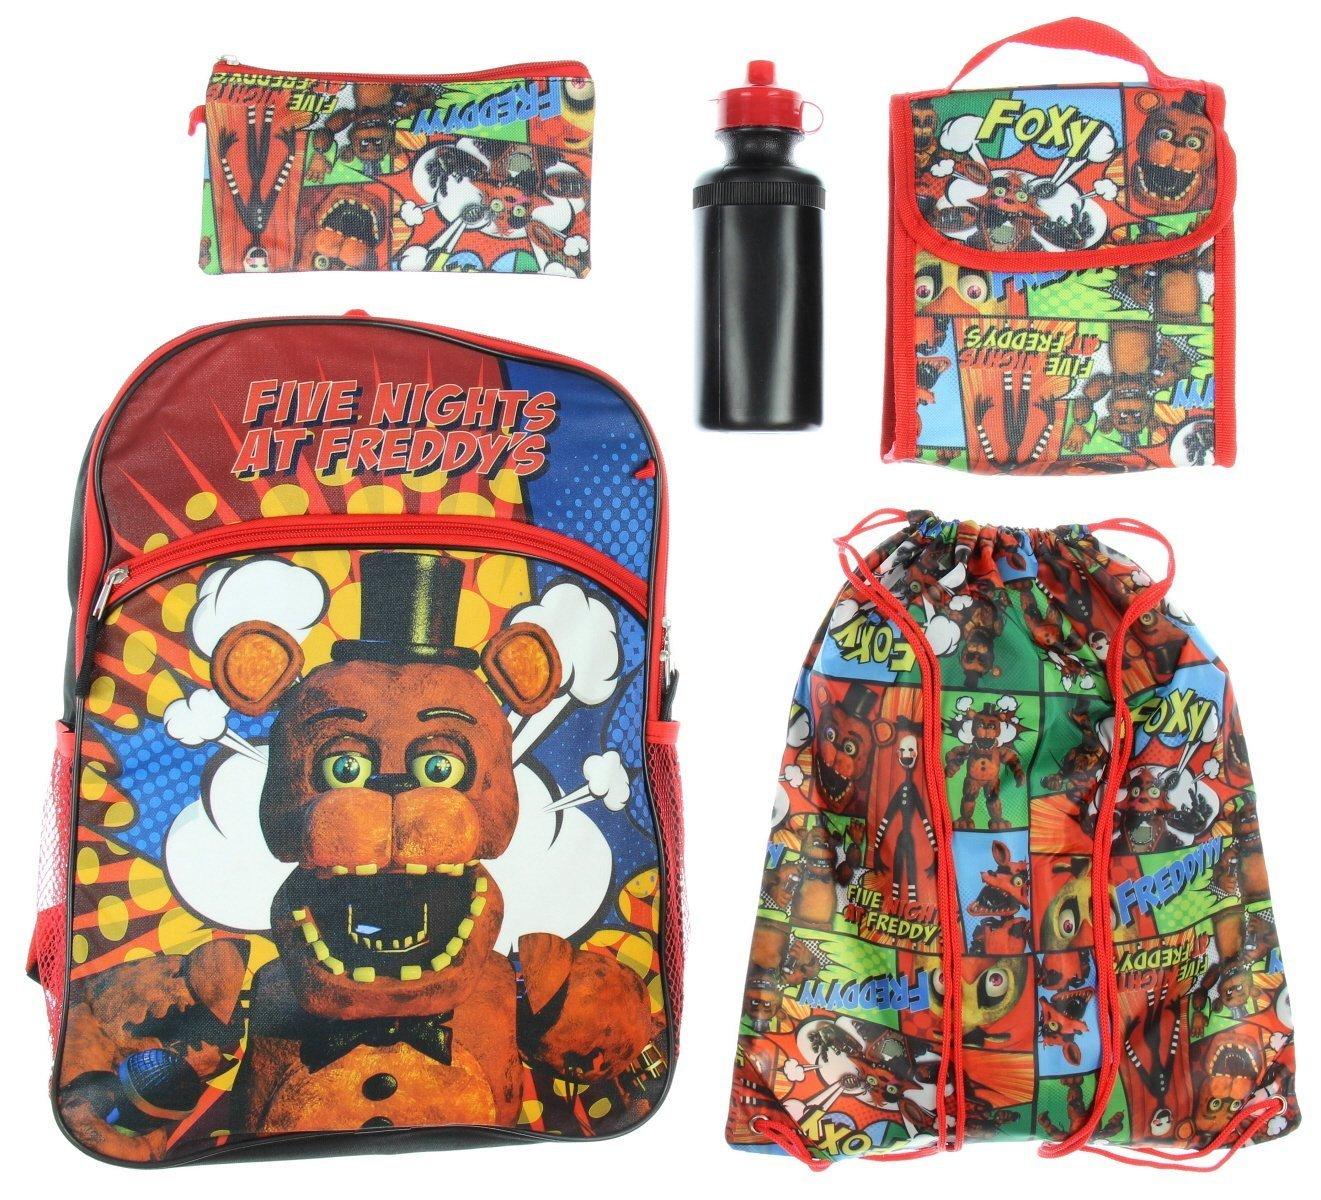 Five Nights At Freddys Backpack Kids 5 Pc Lunch Box Bott Funko Pop Fnaf Freddy Water Bottle Cinch Bag Set Backpacks